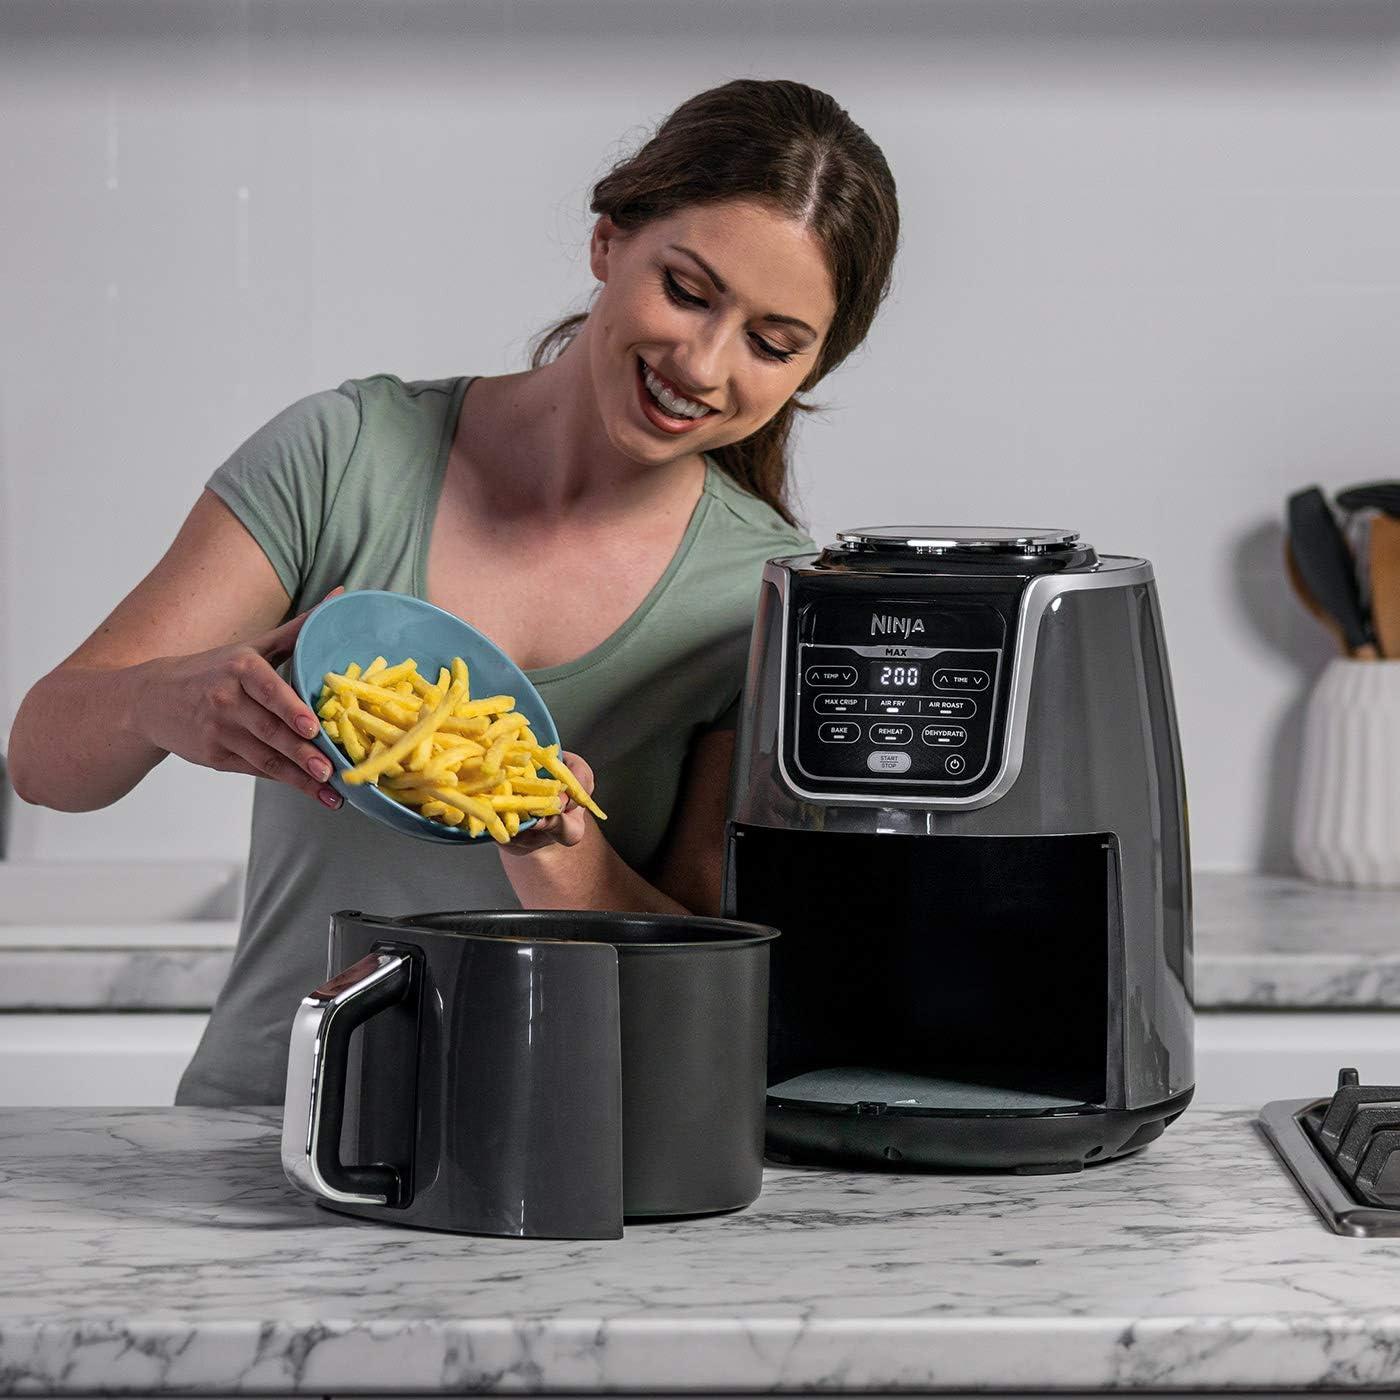 Non Stick Ceramic AF160EU Plastic Pan Coated Crisper Plate 6 Cooking Functions 1750W 5.2L 5.2 liters Ninja Air Fryer Max Grey//Black